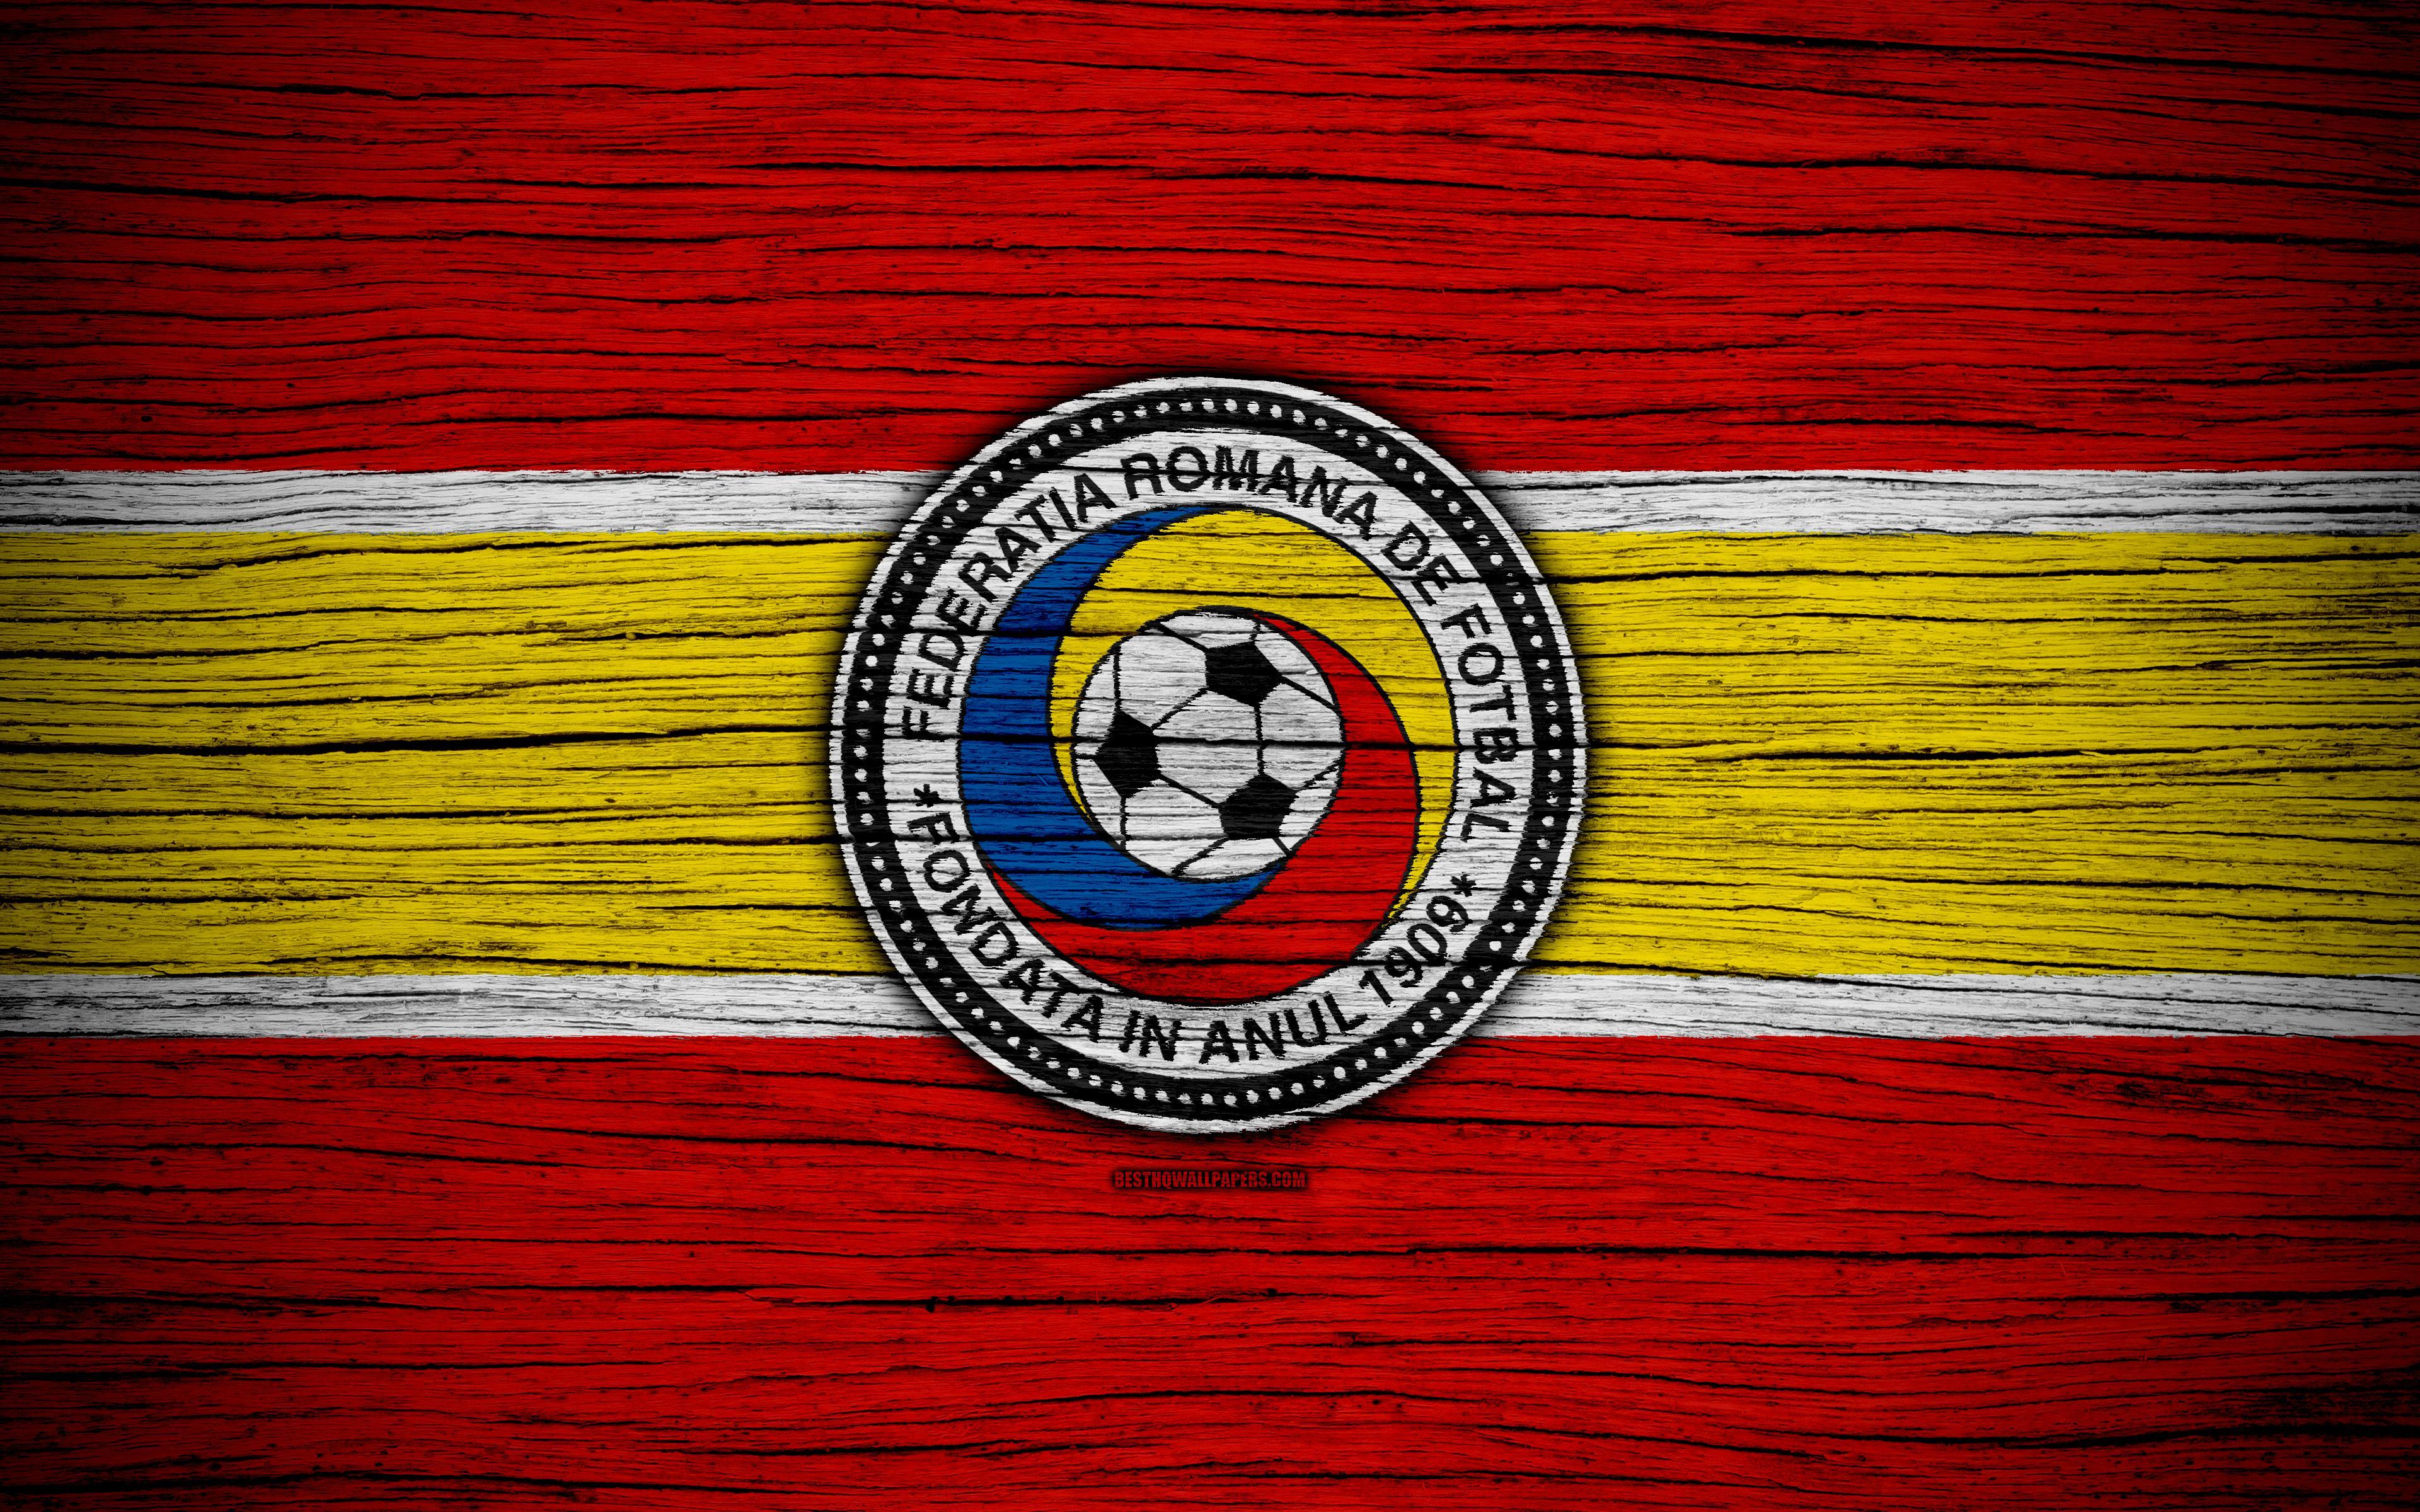 Romania National Football Team Backgrounds 6